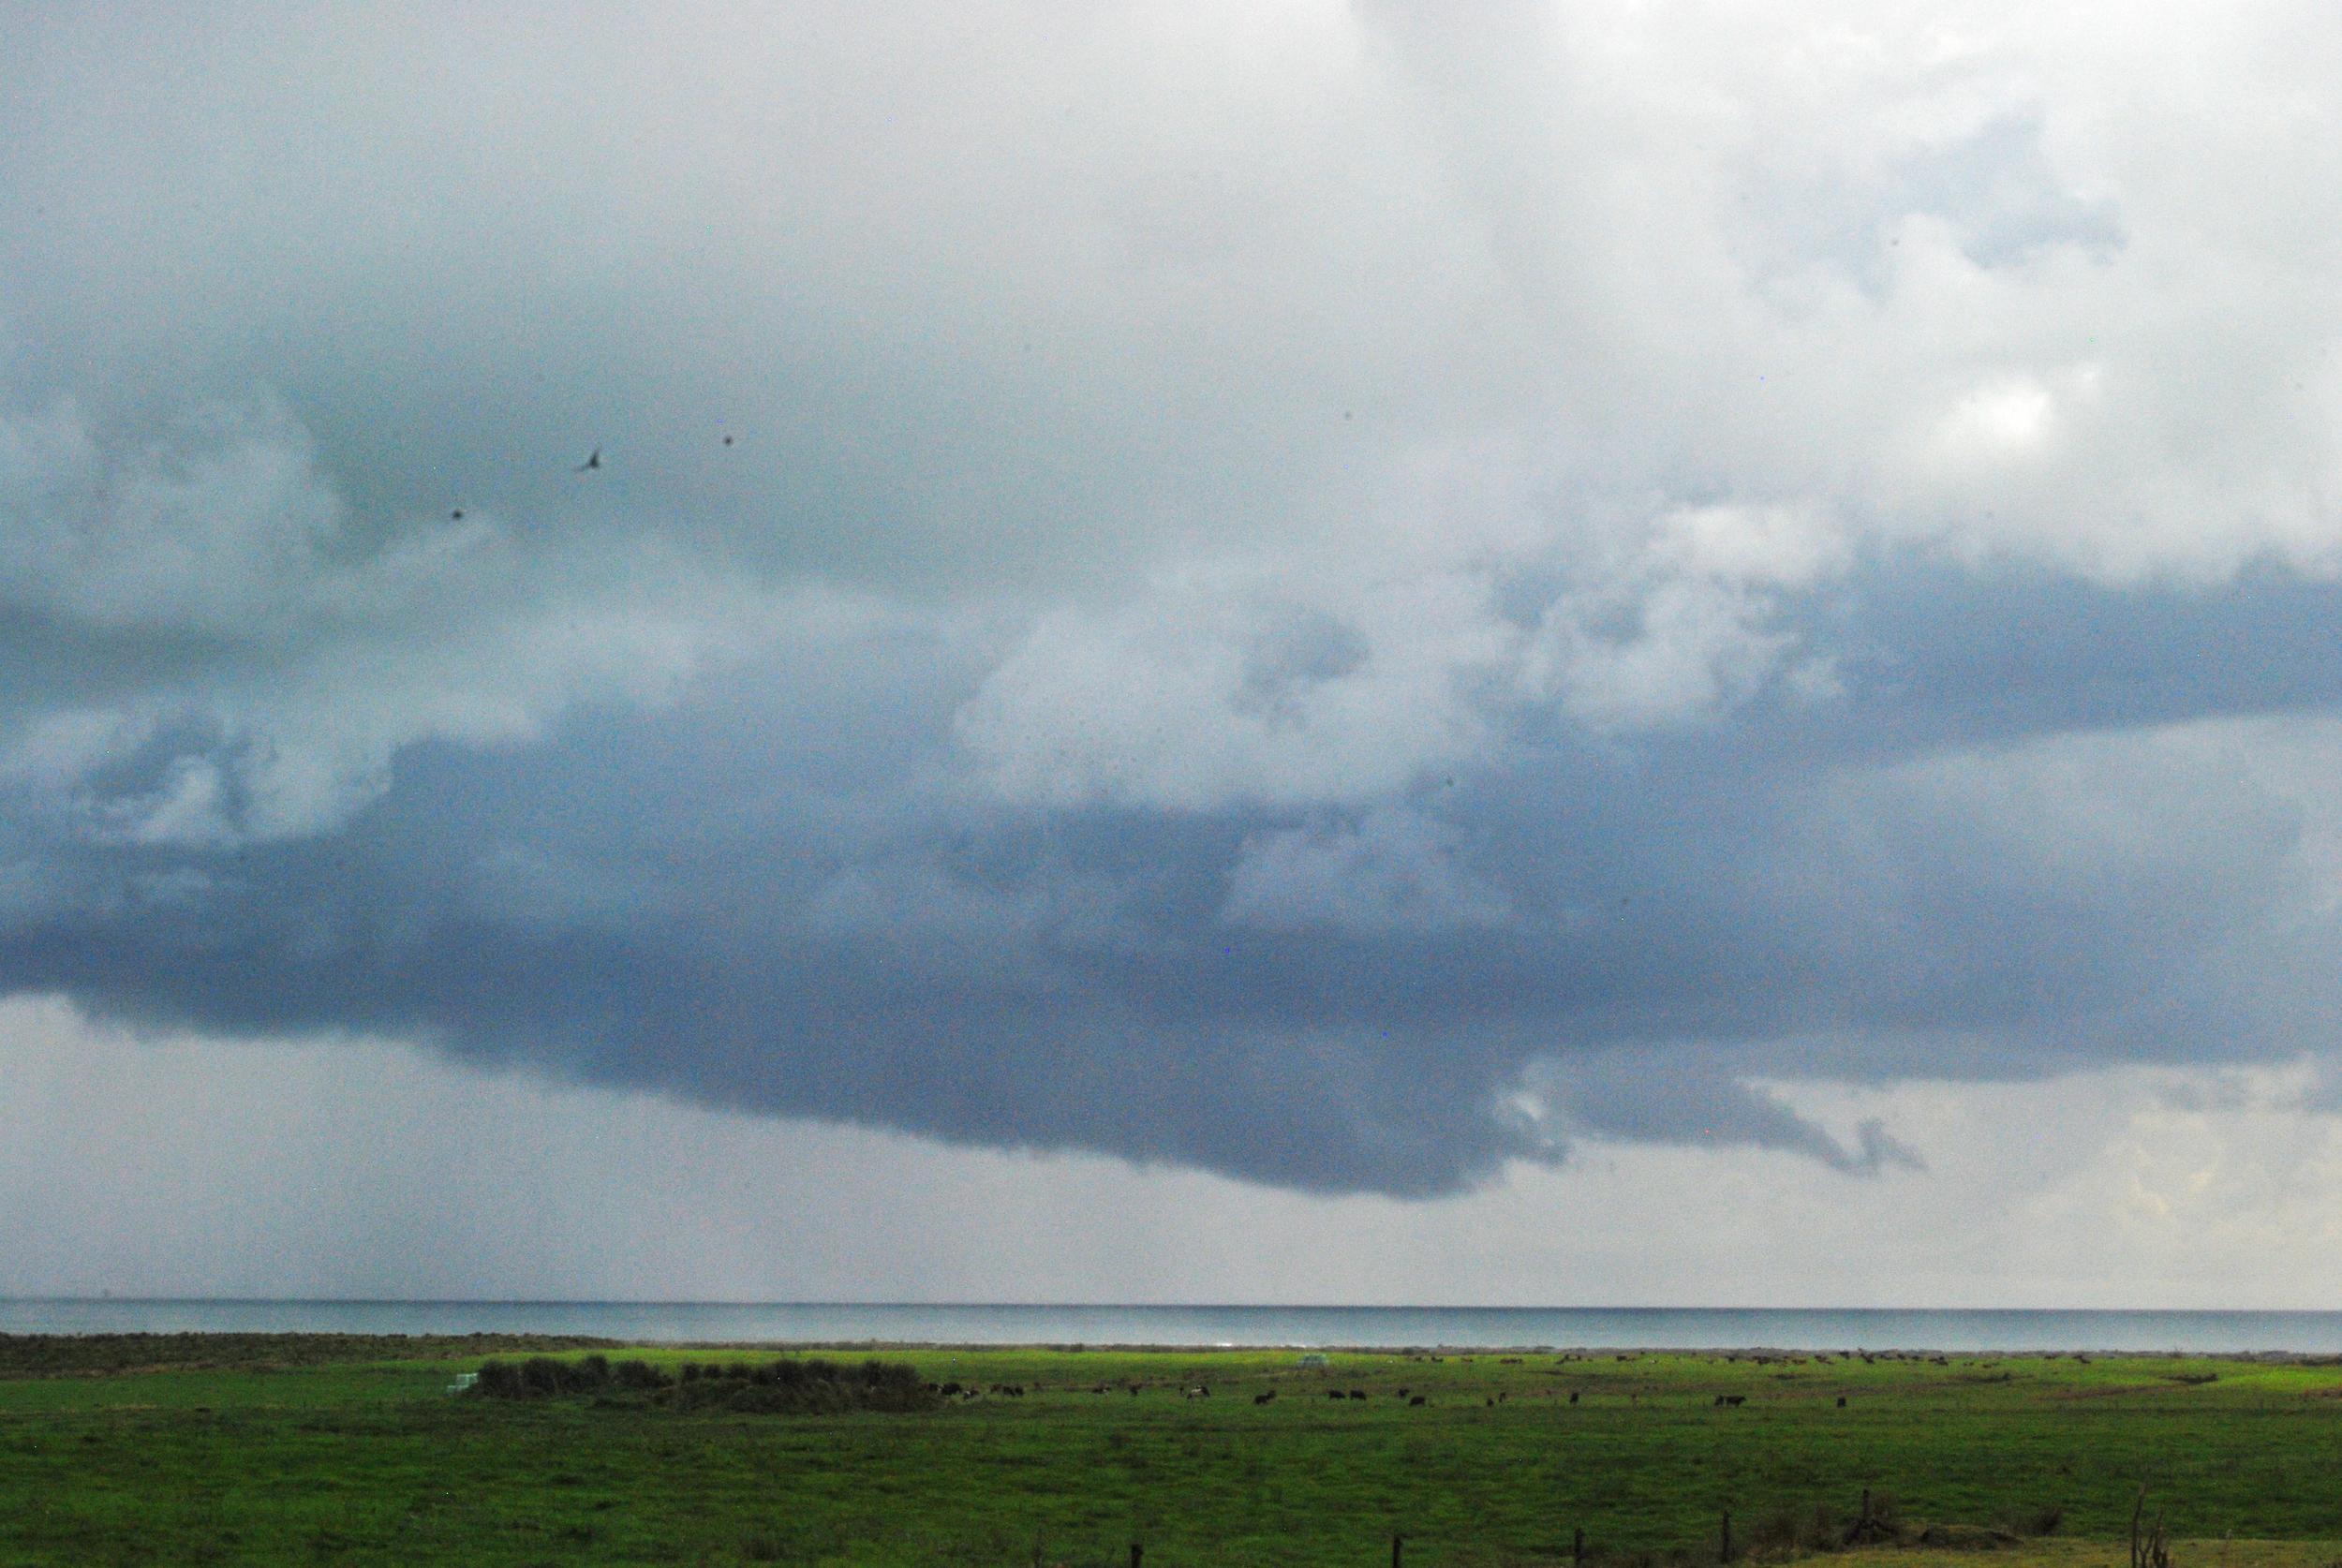 RAIN CLOUDS OVER THE SEA